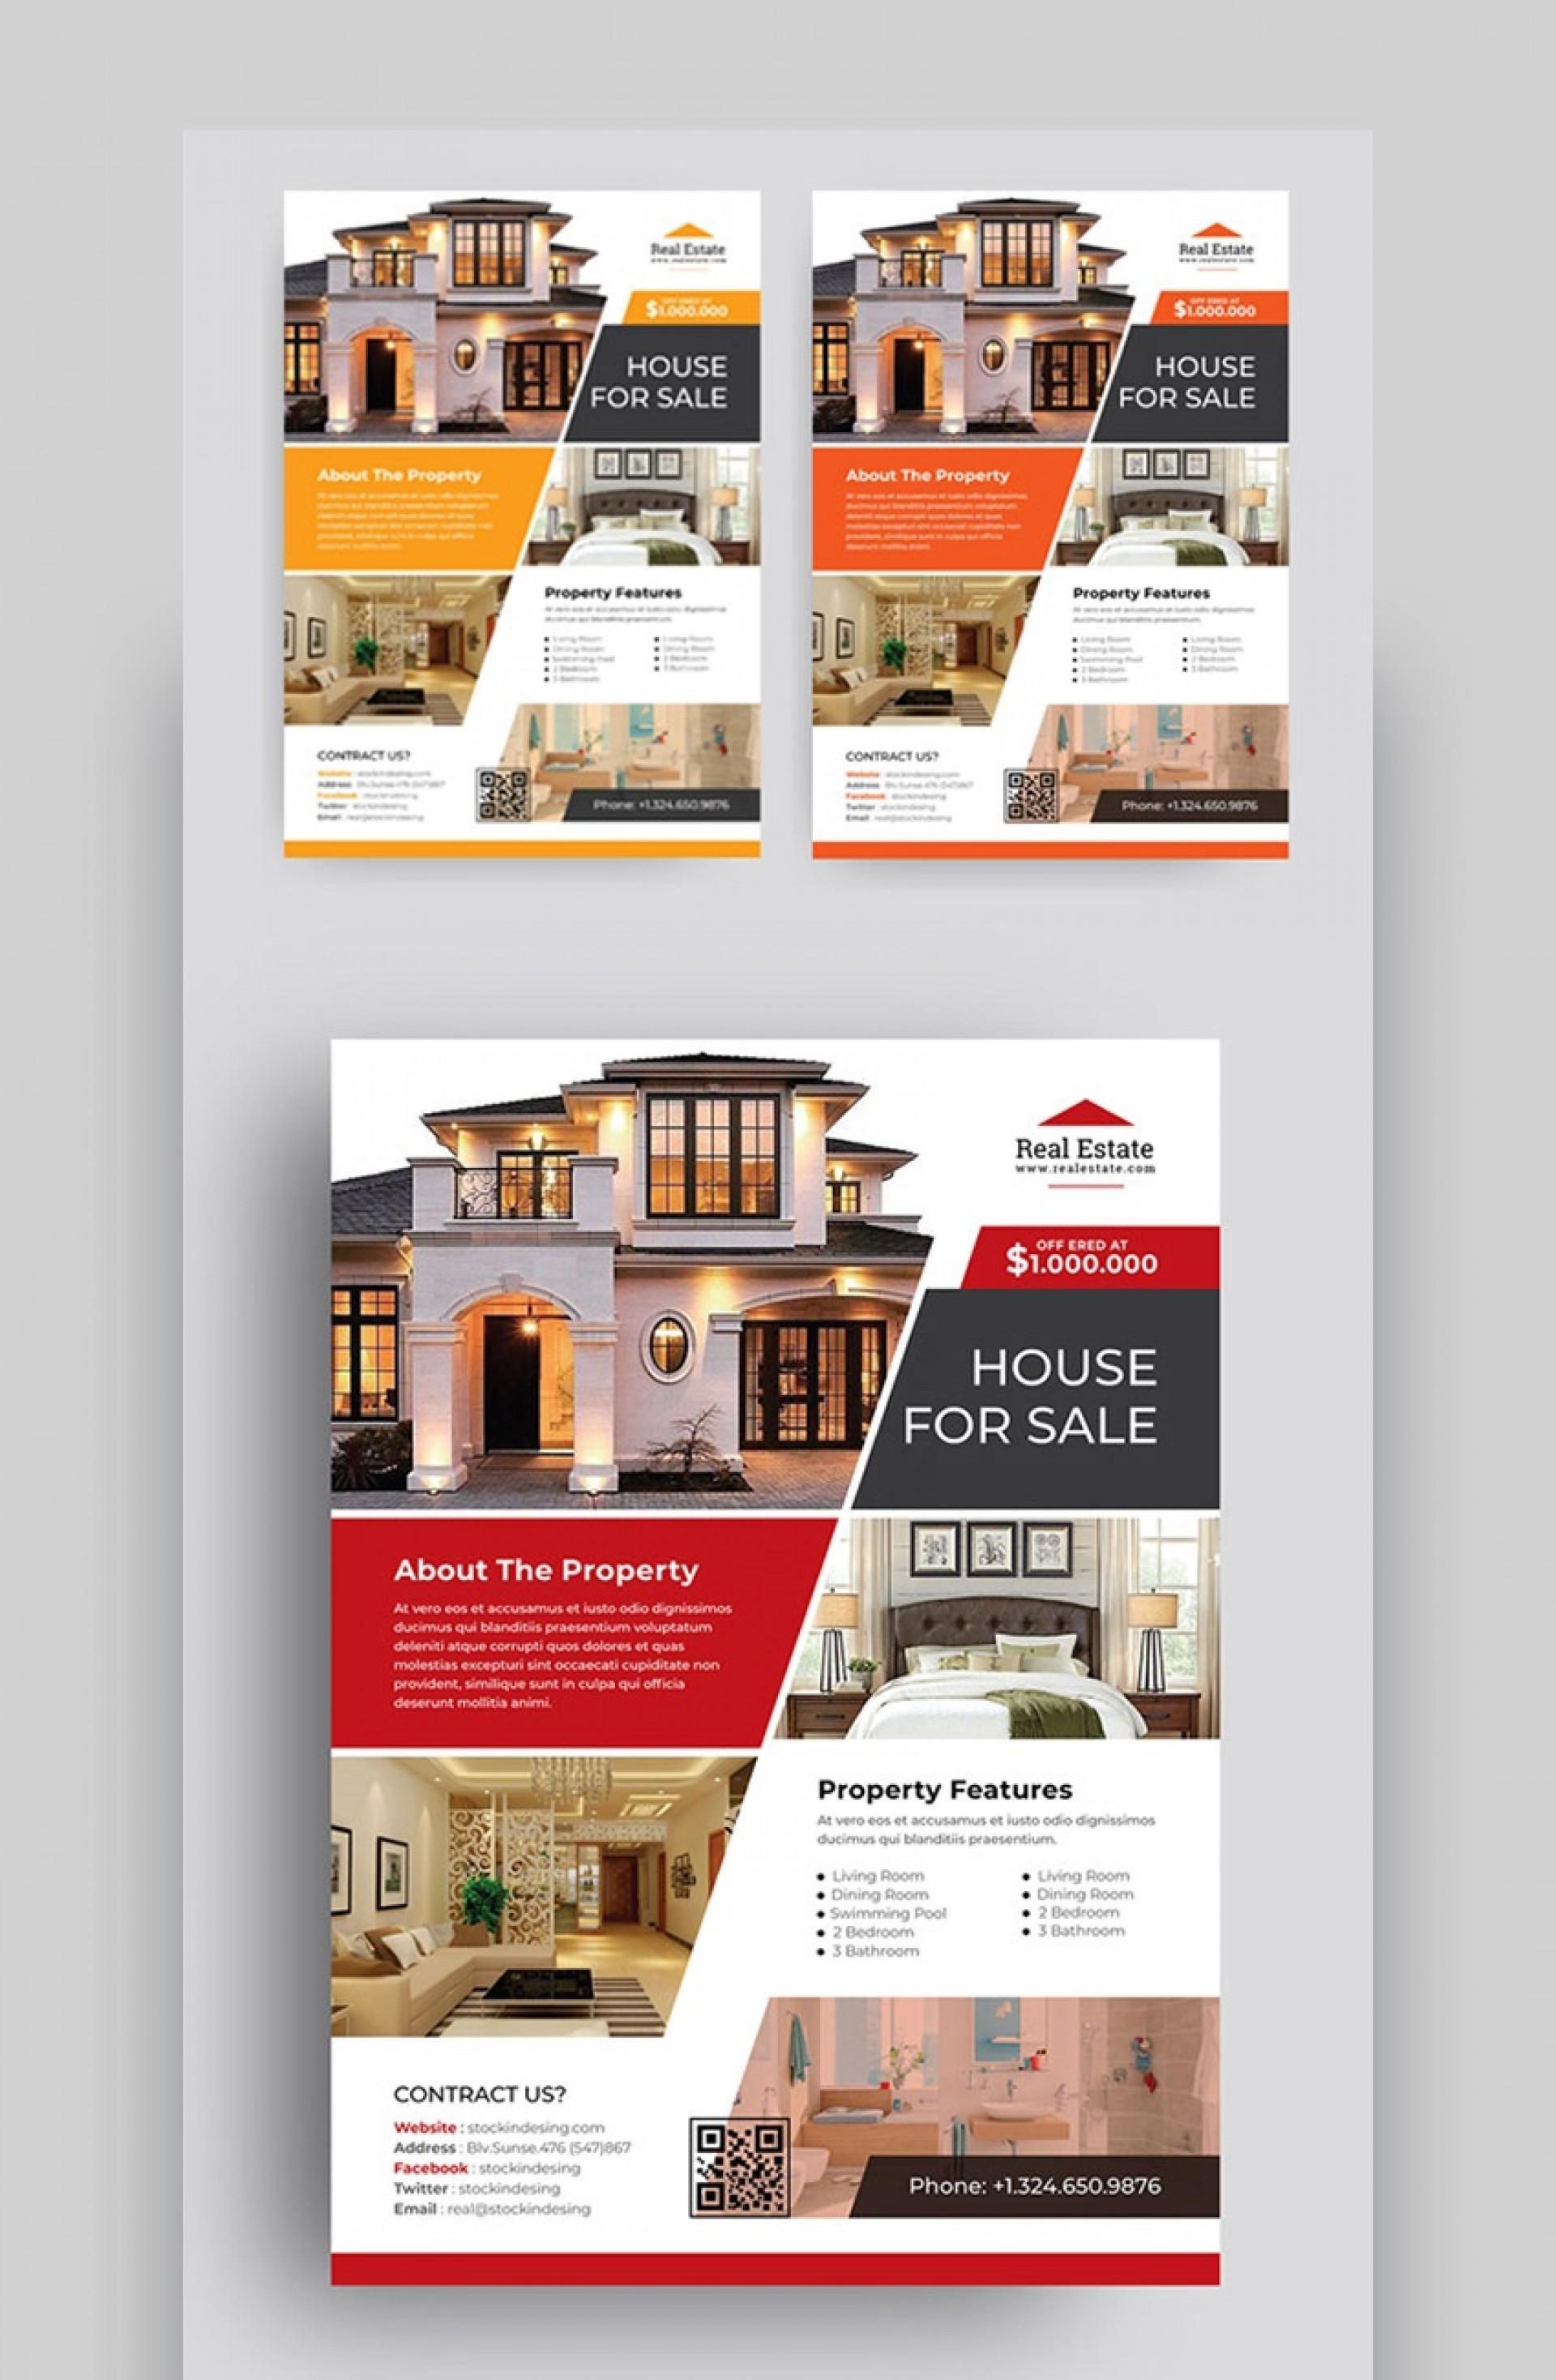 007 Sensational Real Estate Marketing Flyer Template Free Highest Clarity 1920